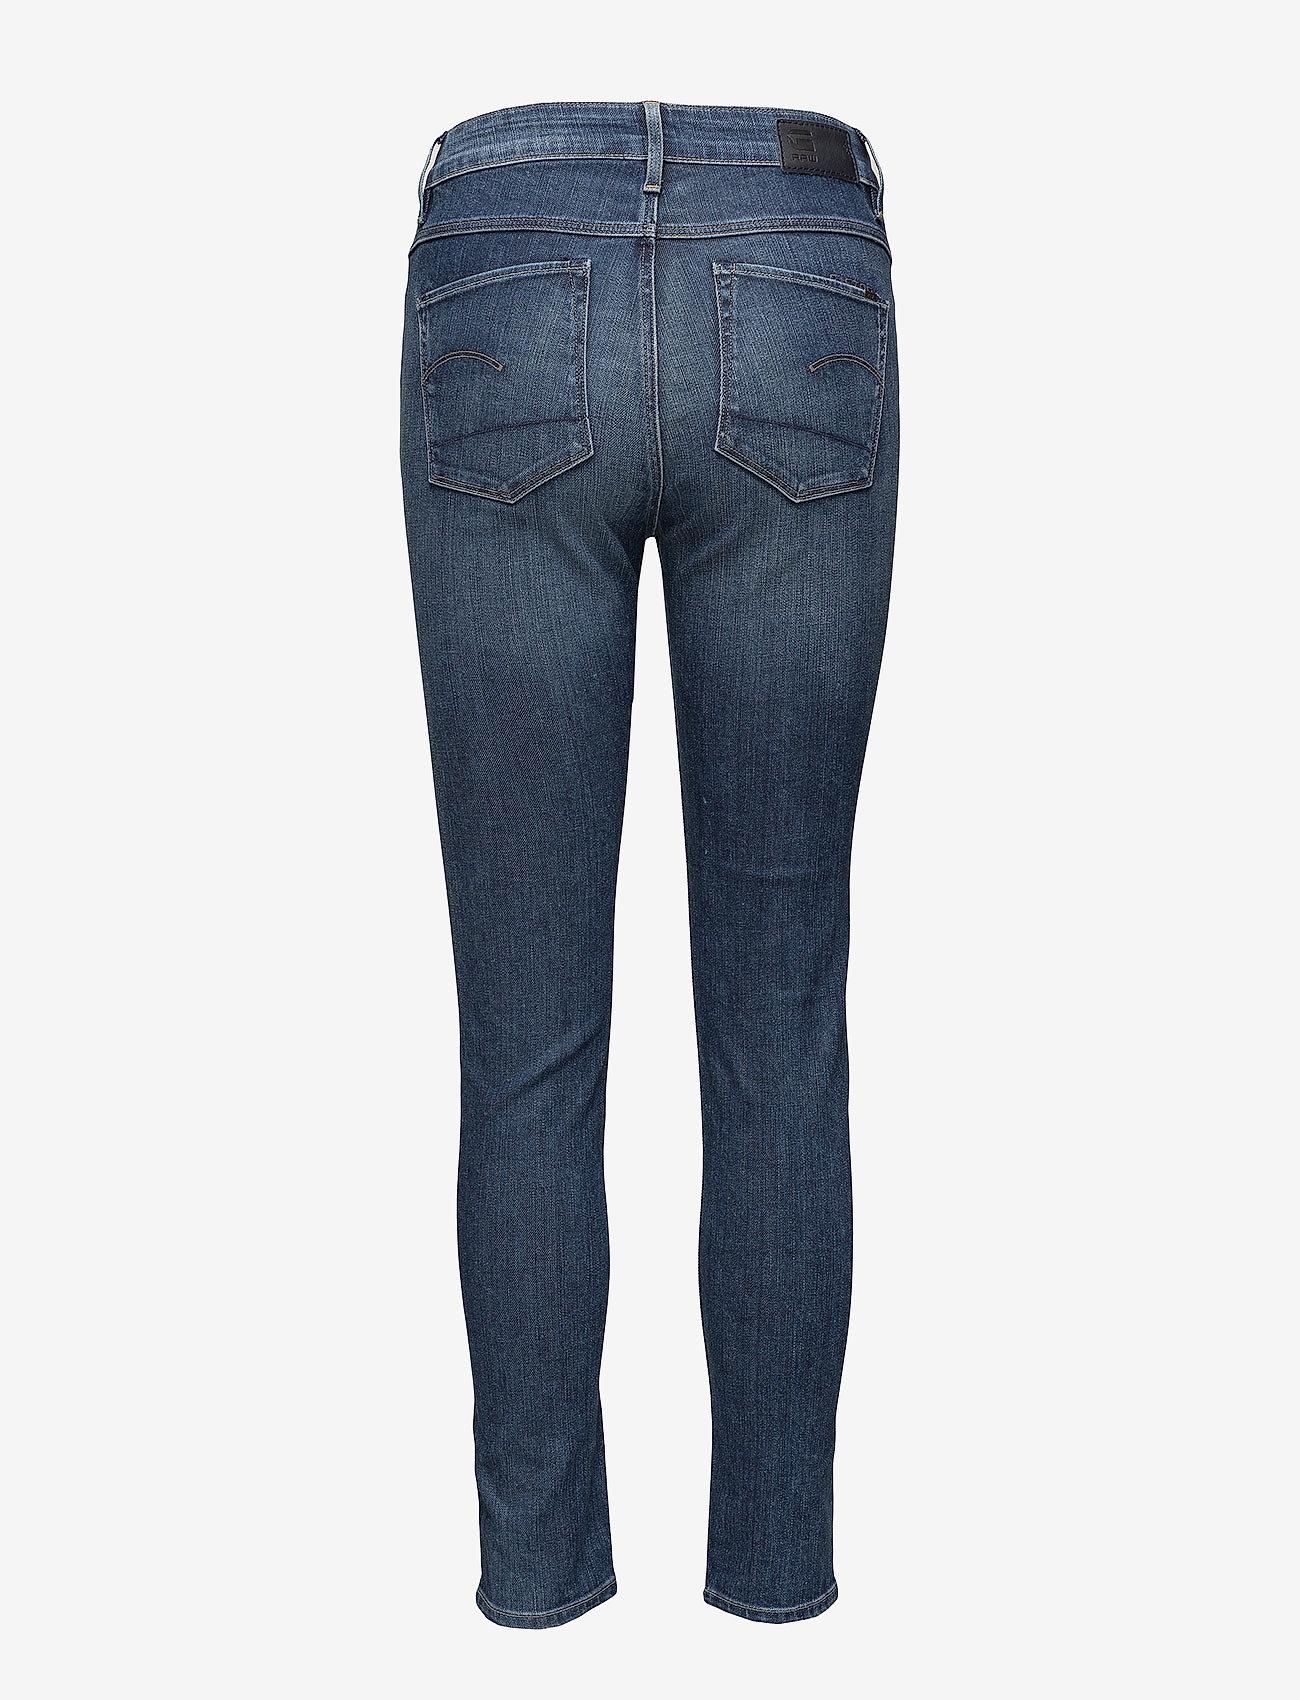 G-star RAW - 3301 ult hi sup - jeans skinny - dk aged - 1